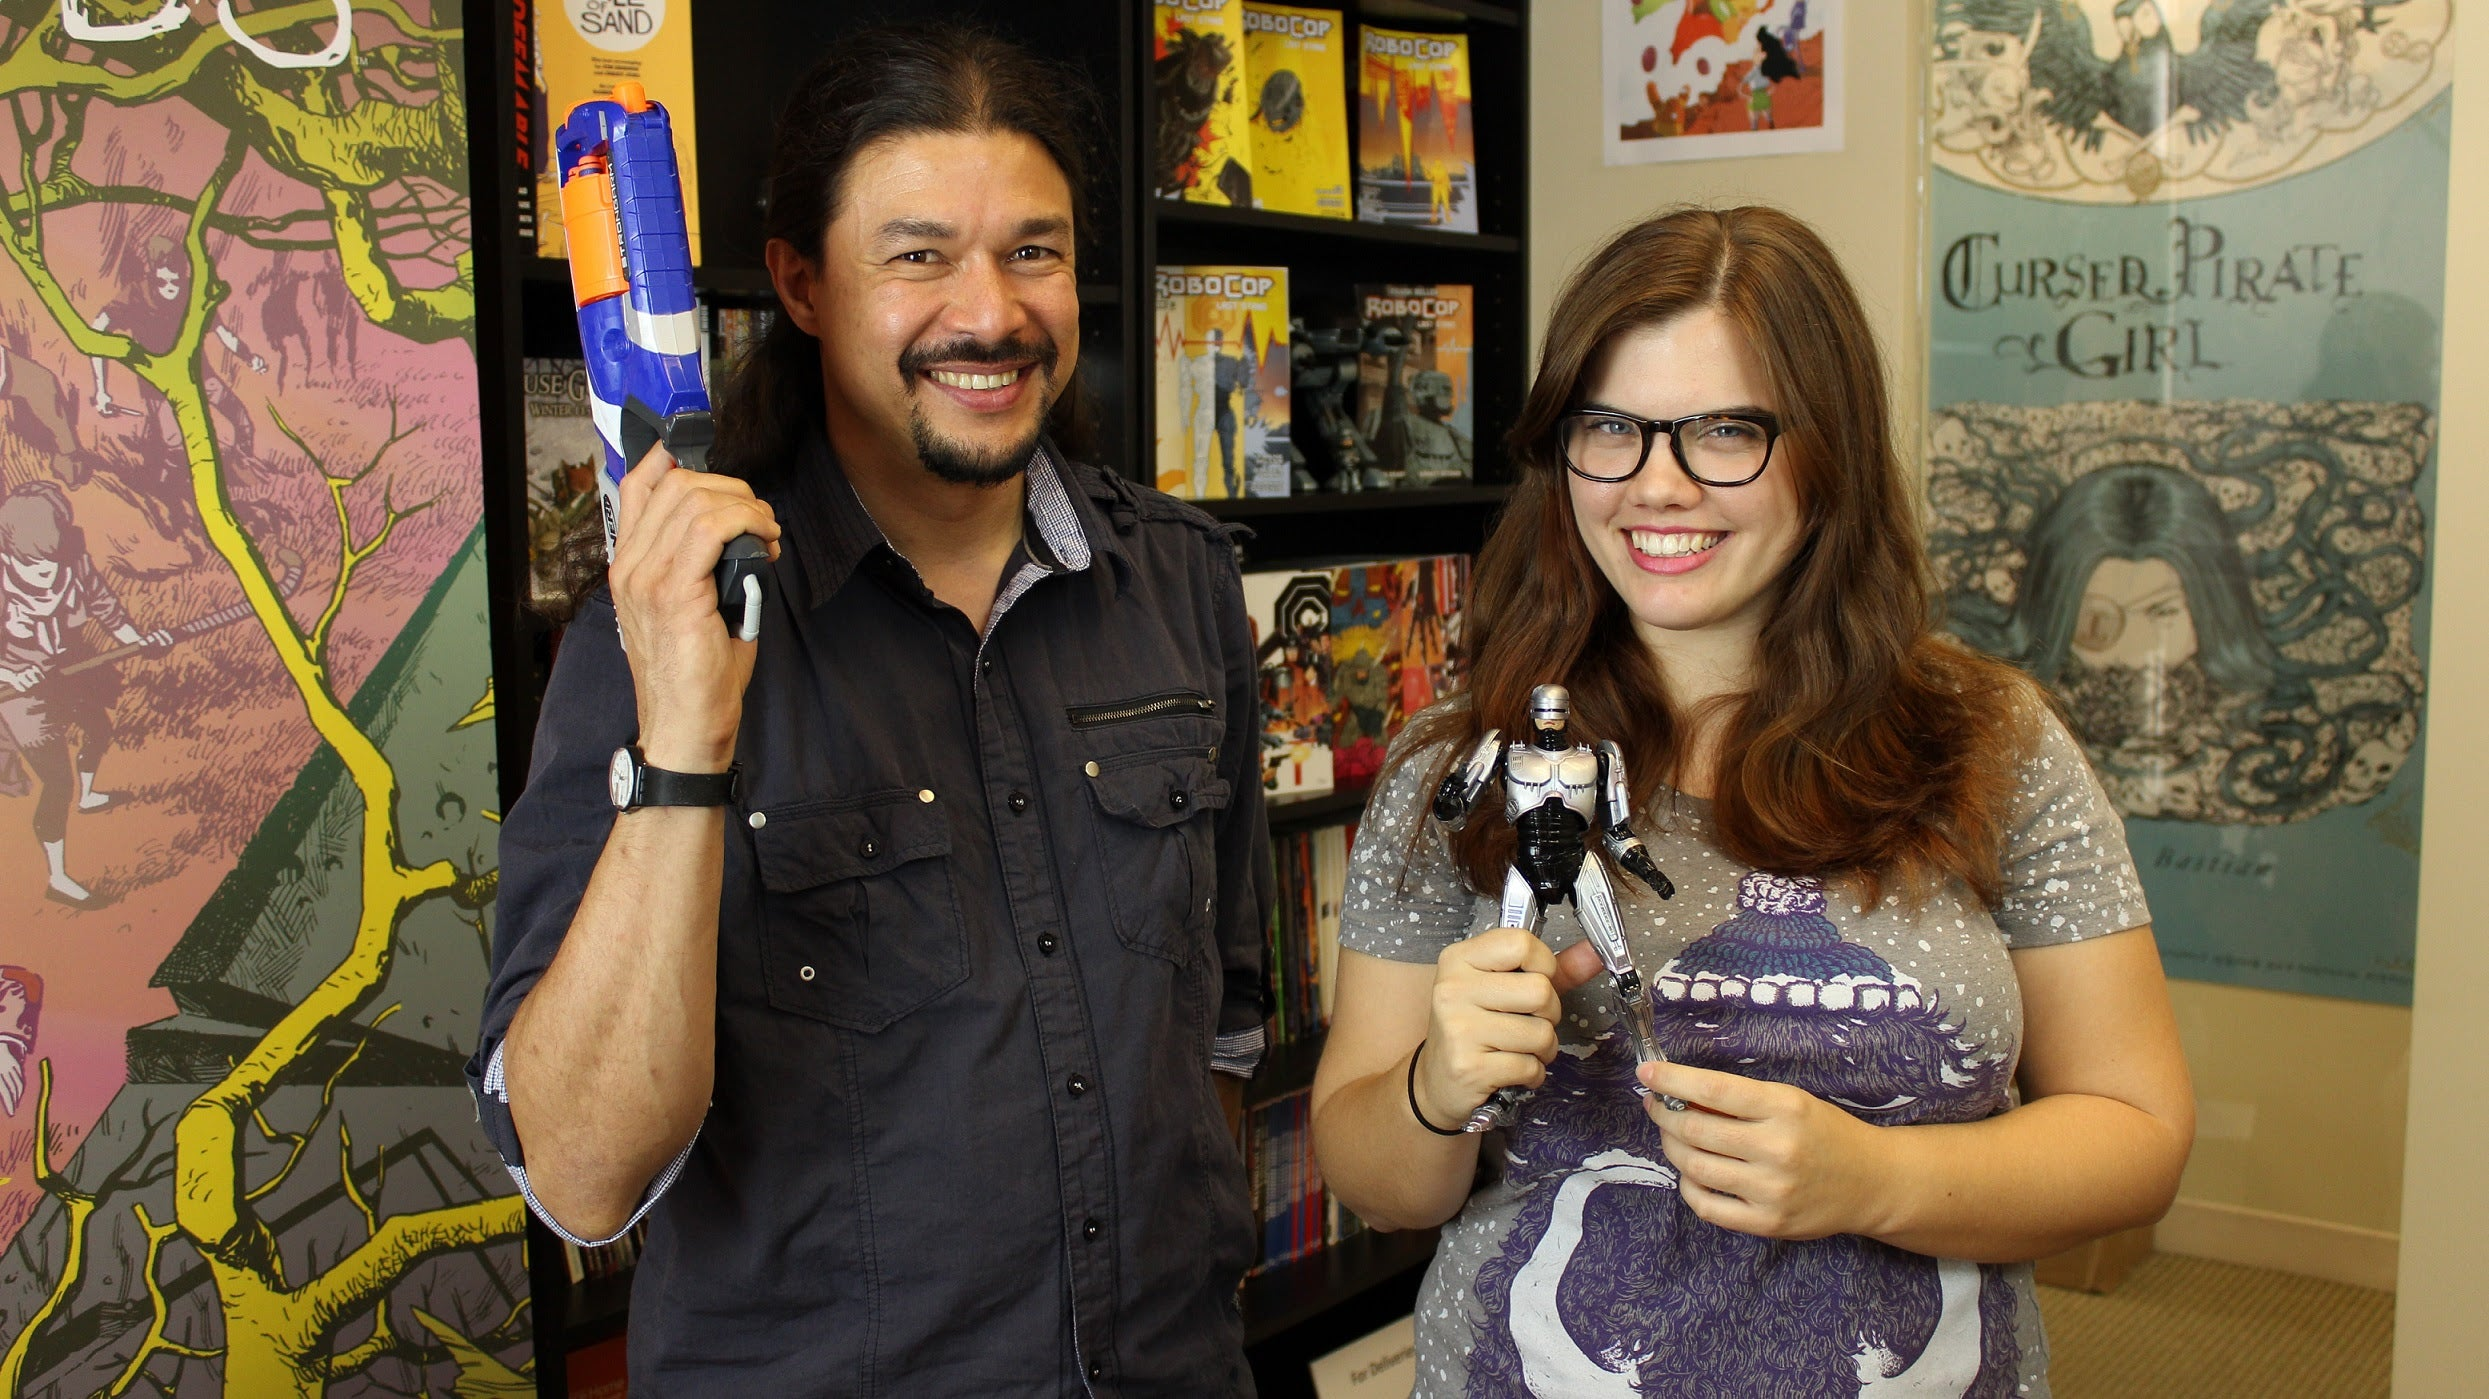 Guardians of the Galaxy's Fon Davis Appears on Buzz on BOOM! To Talk RoboCop